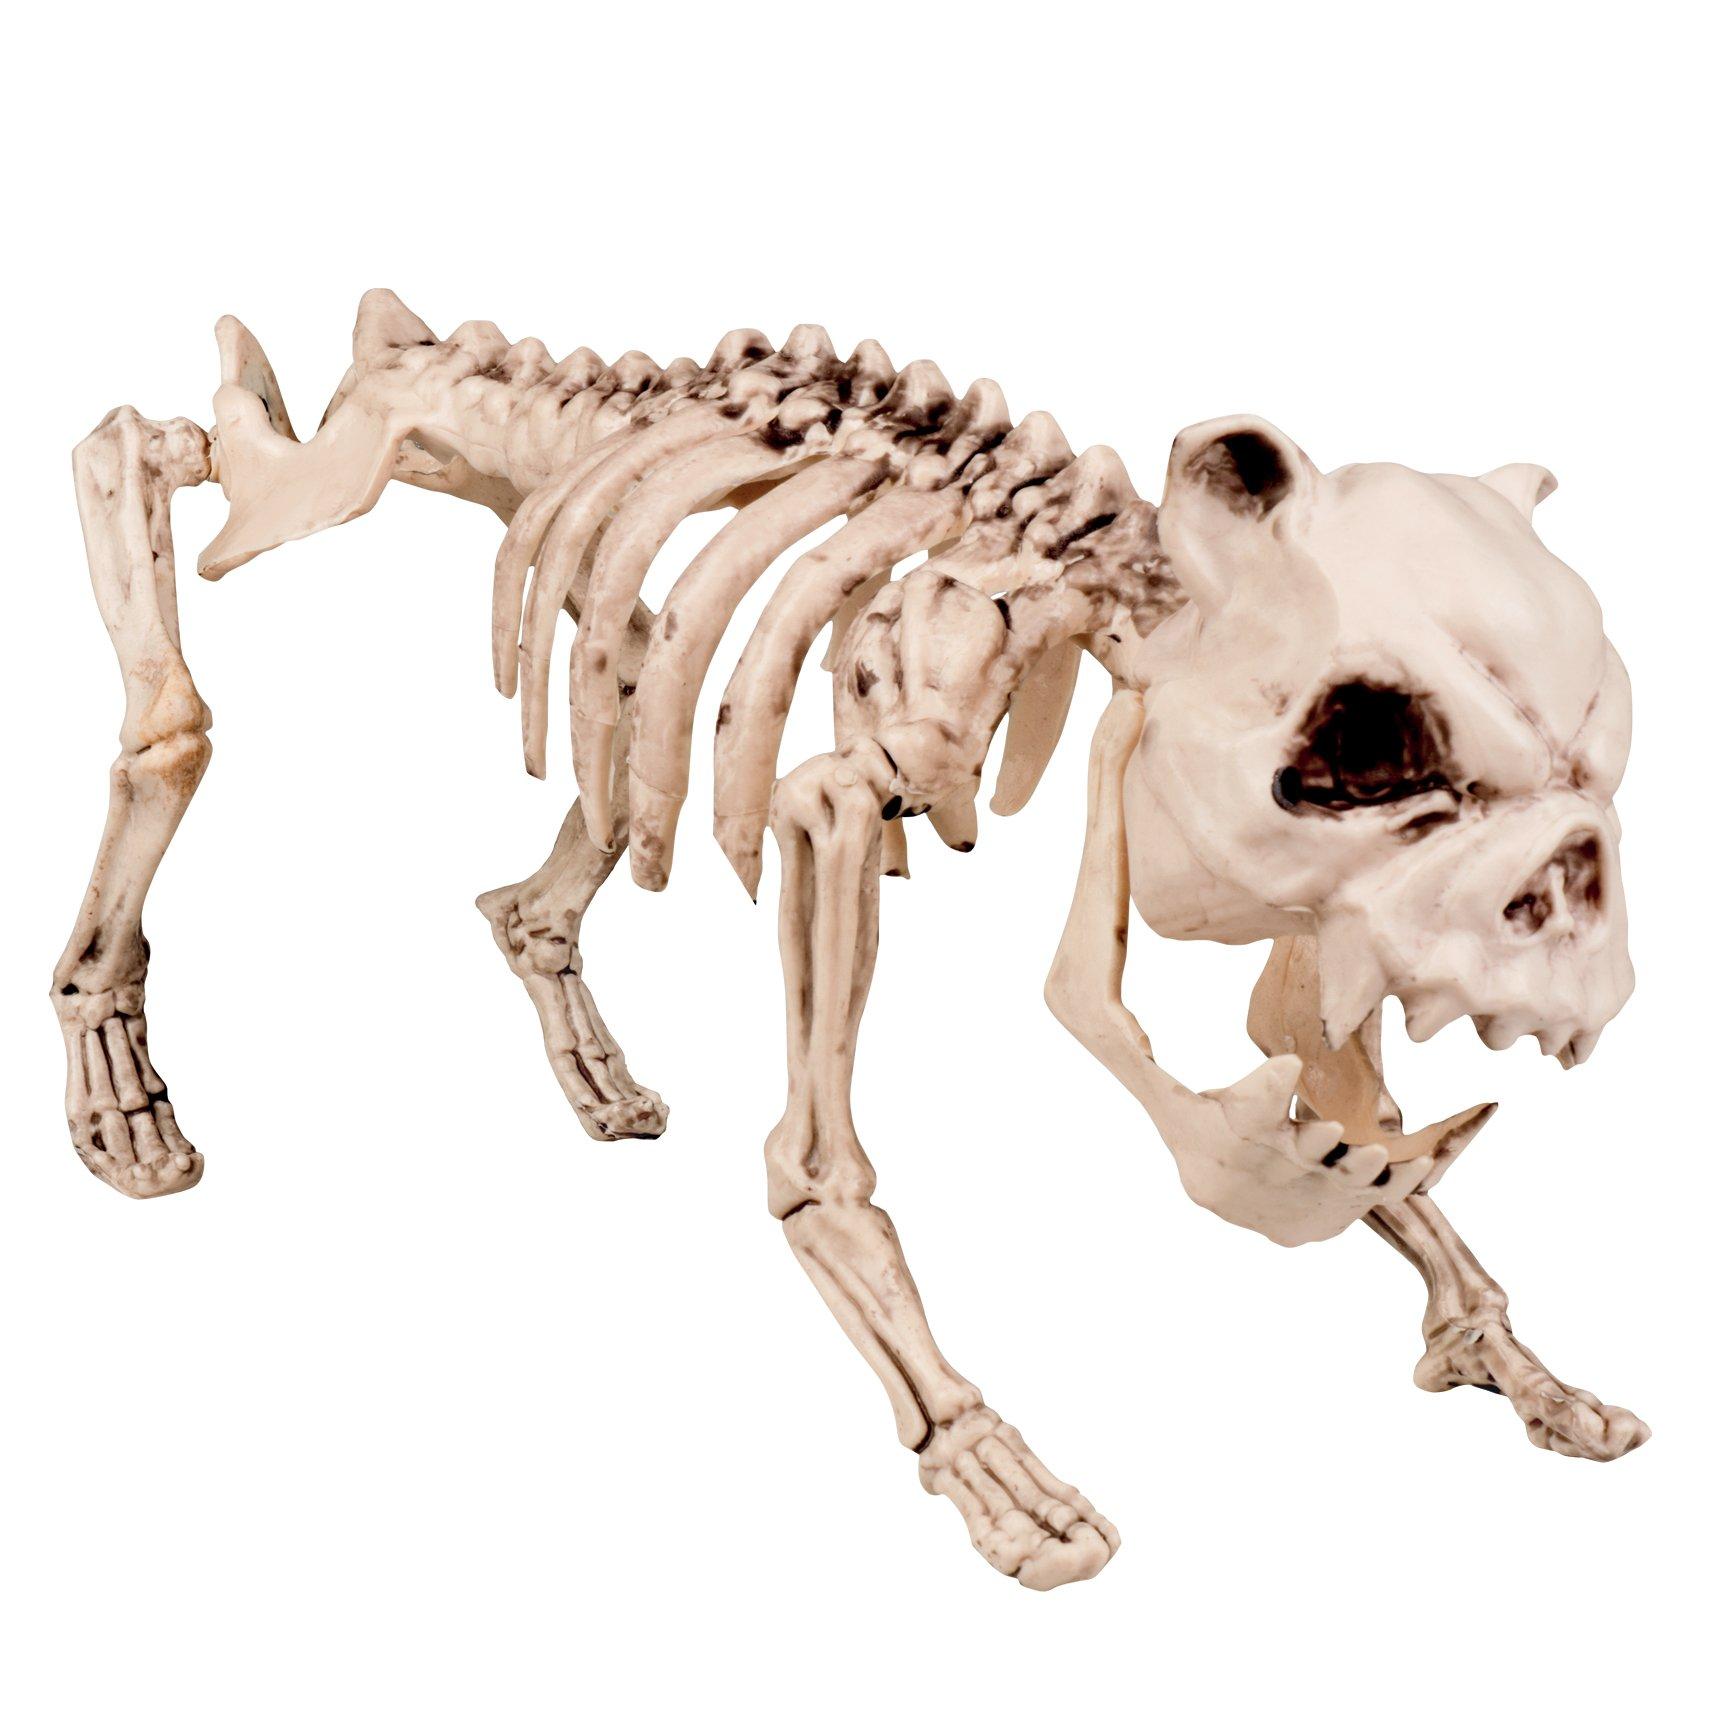 Boland 72095 - Deko-Figur Hundeskelett, Sonstige Spielwaren